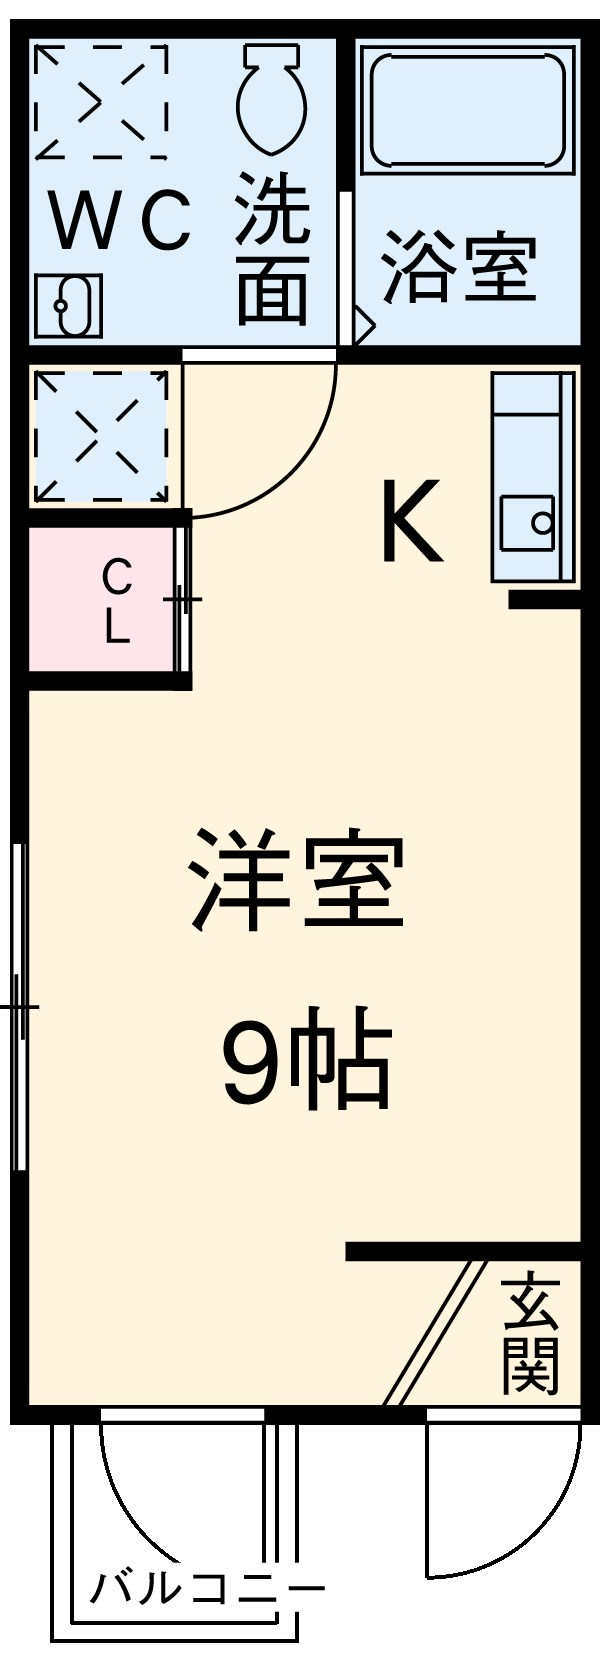 Residence hale ohana・202号室の間取り